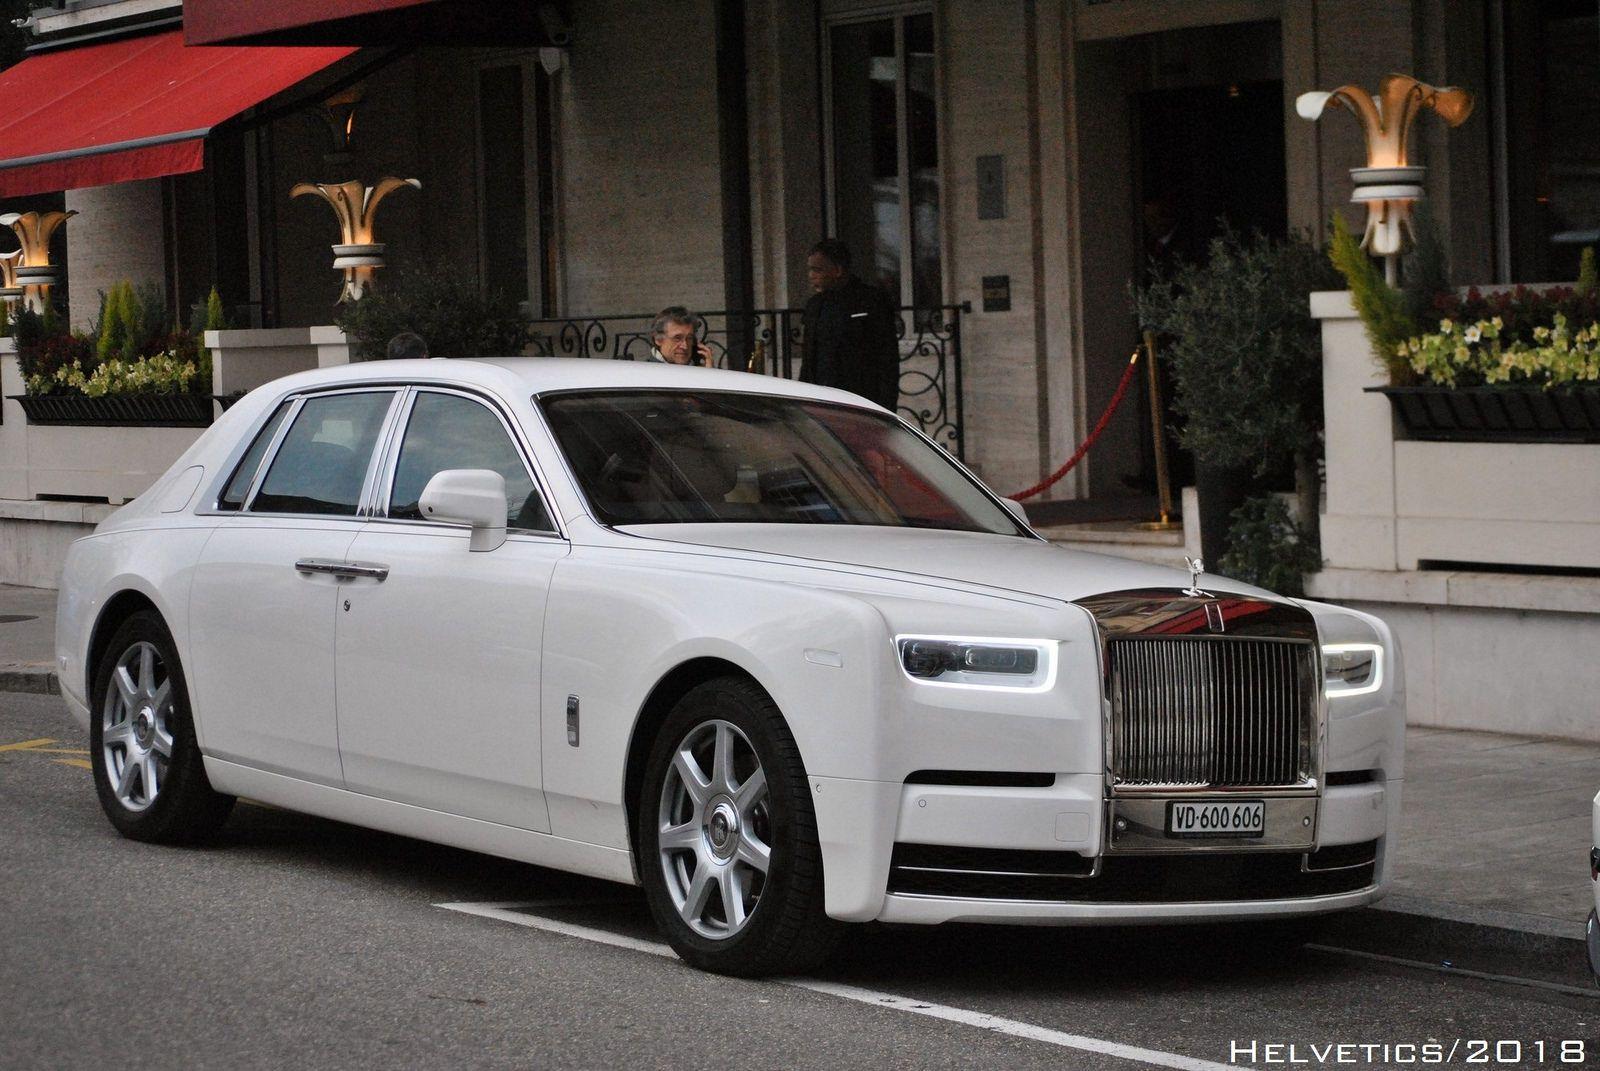 Rolls Royce Phantom Switzerland Vaud Luxury Cars Rolls Royce Rolls Royce Rolls Royce Phantom